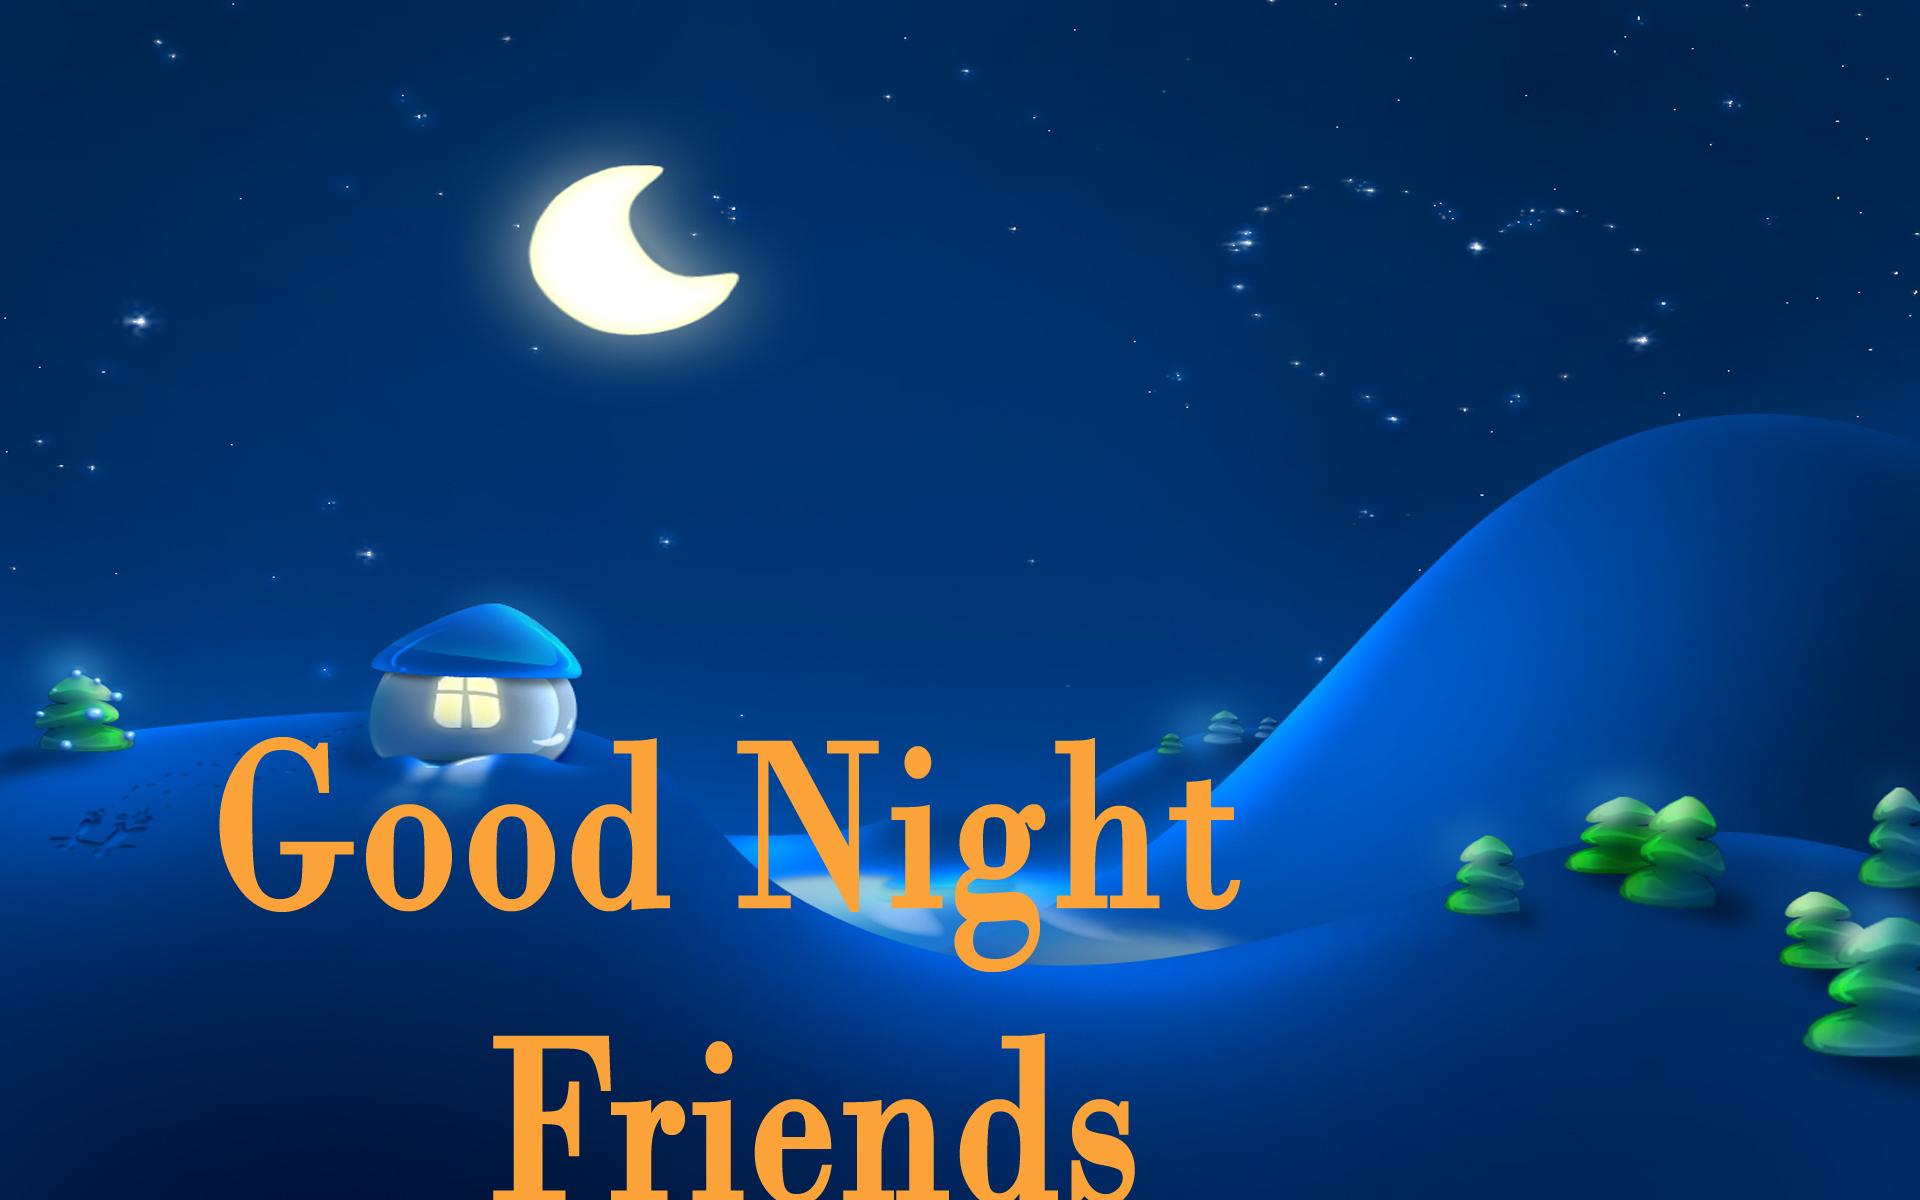 Good Night Greetings Quotes Wishes Hd Wallpapers Free Download صور مساء الخير رمزيات مكتوب عليها Good Night سوبر كايرو